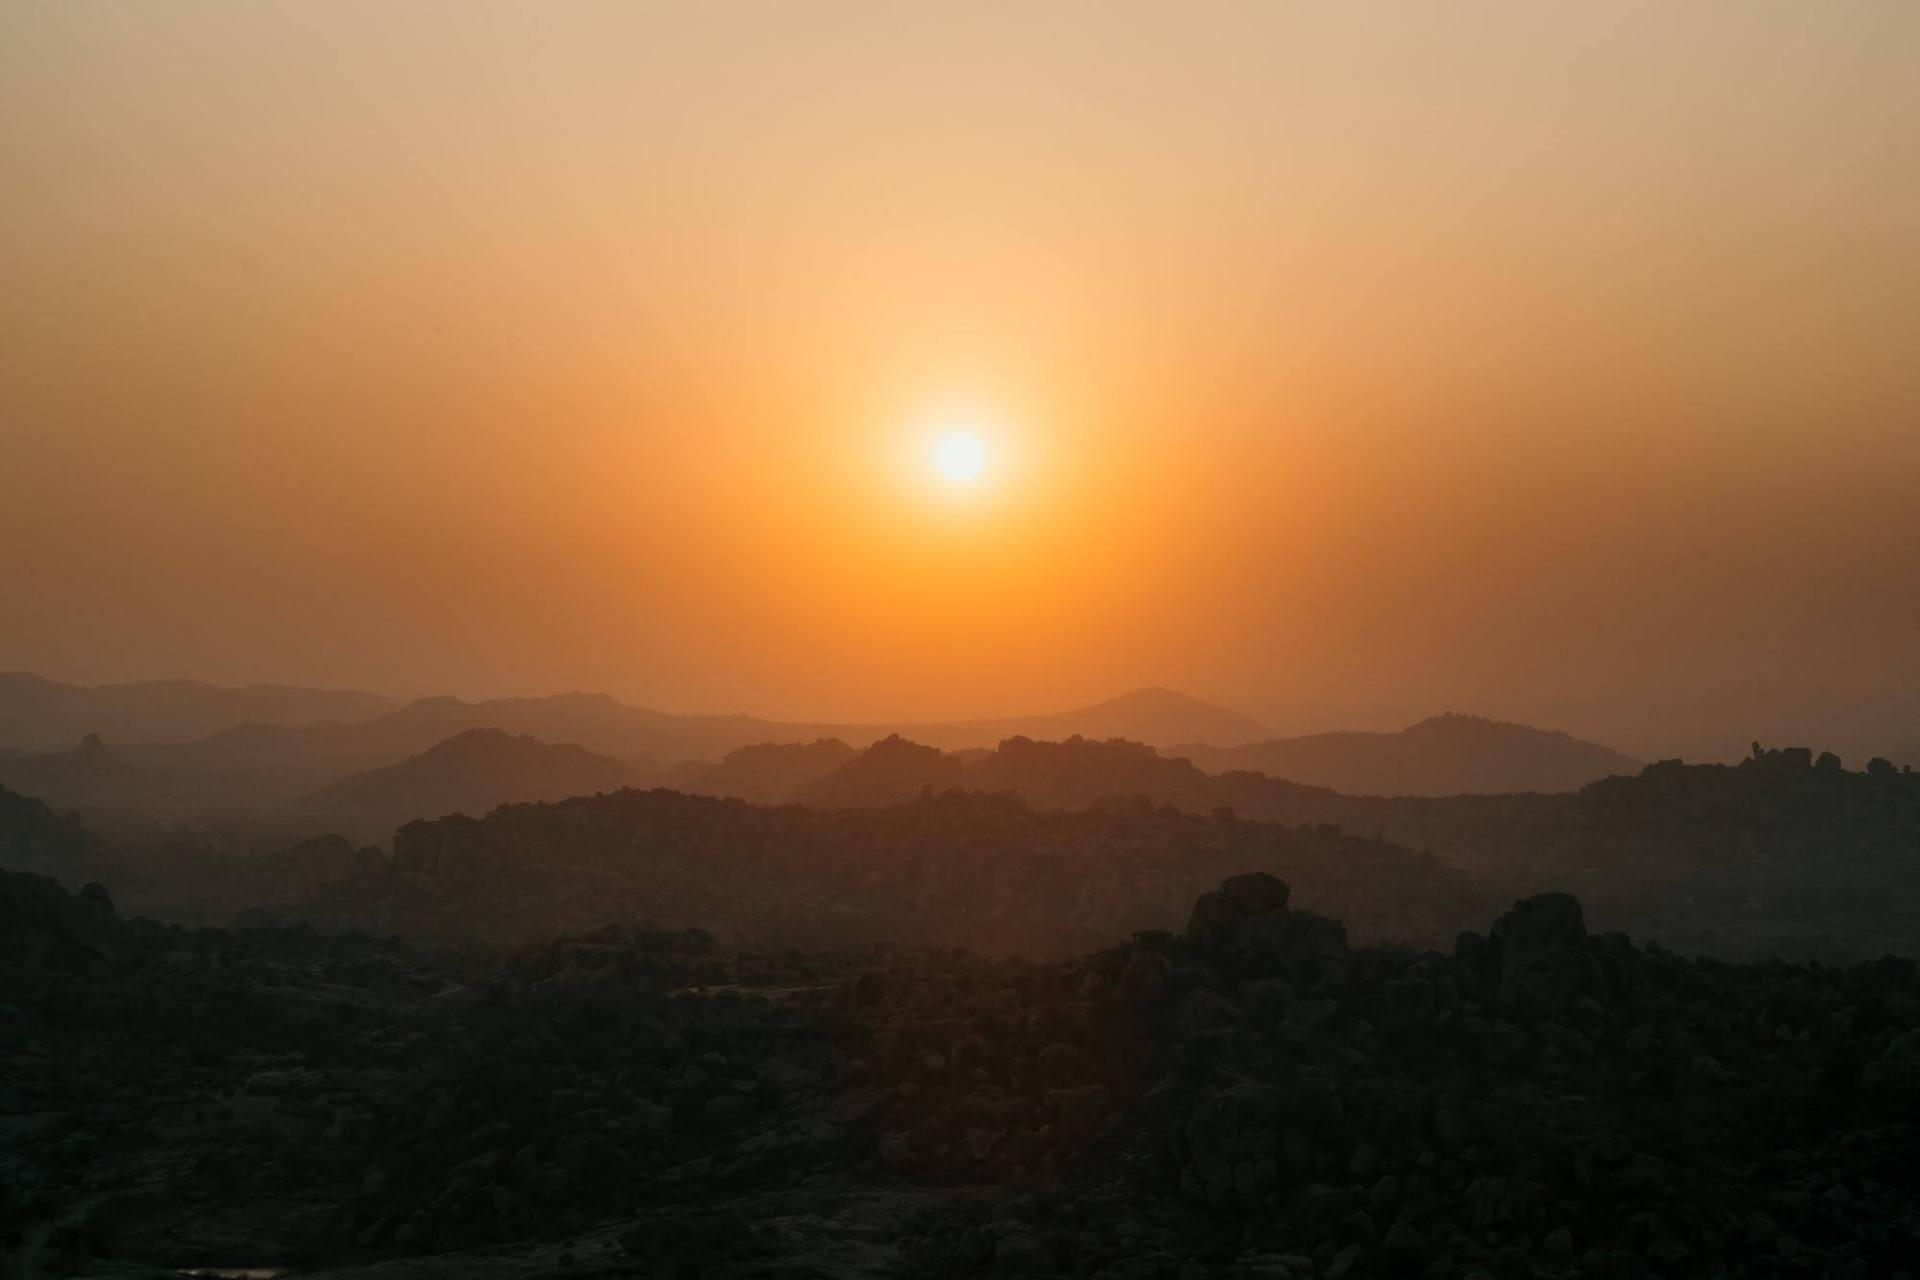 coucher de soleil en Inde